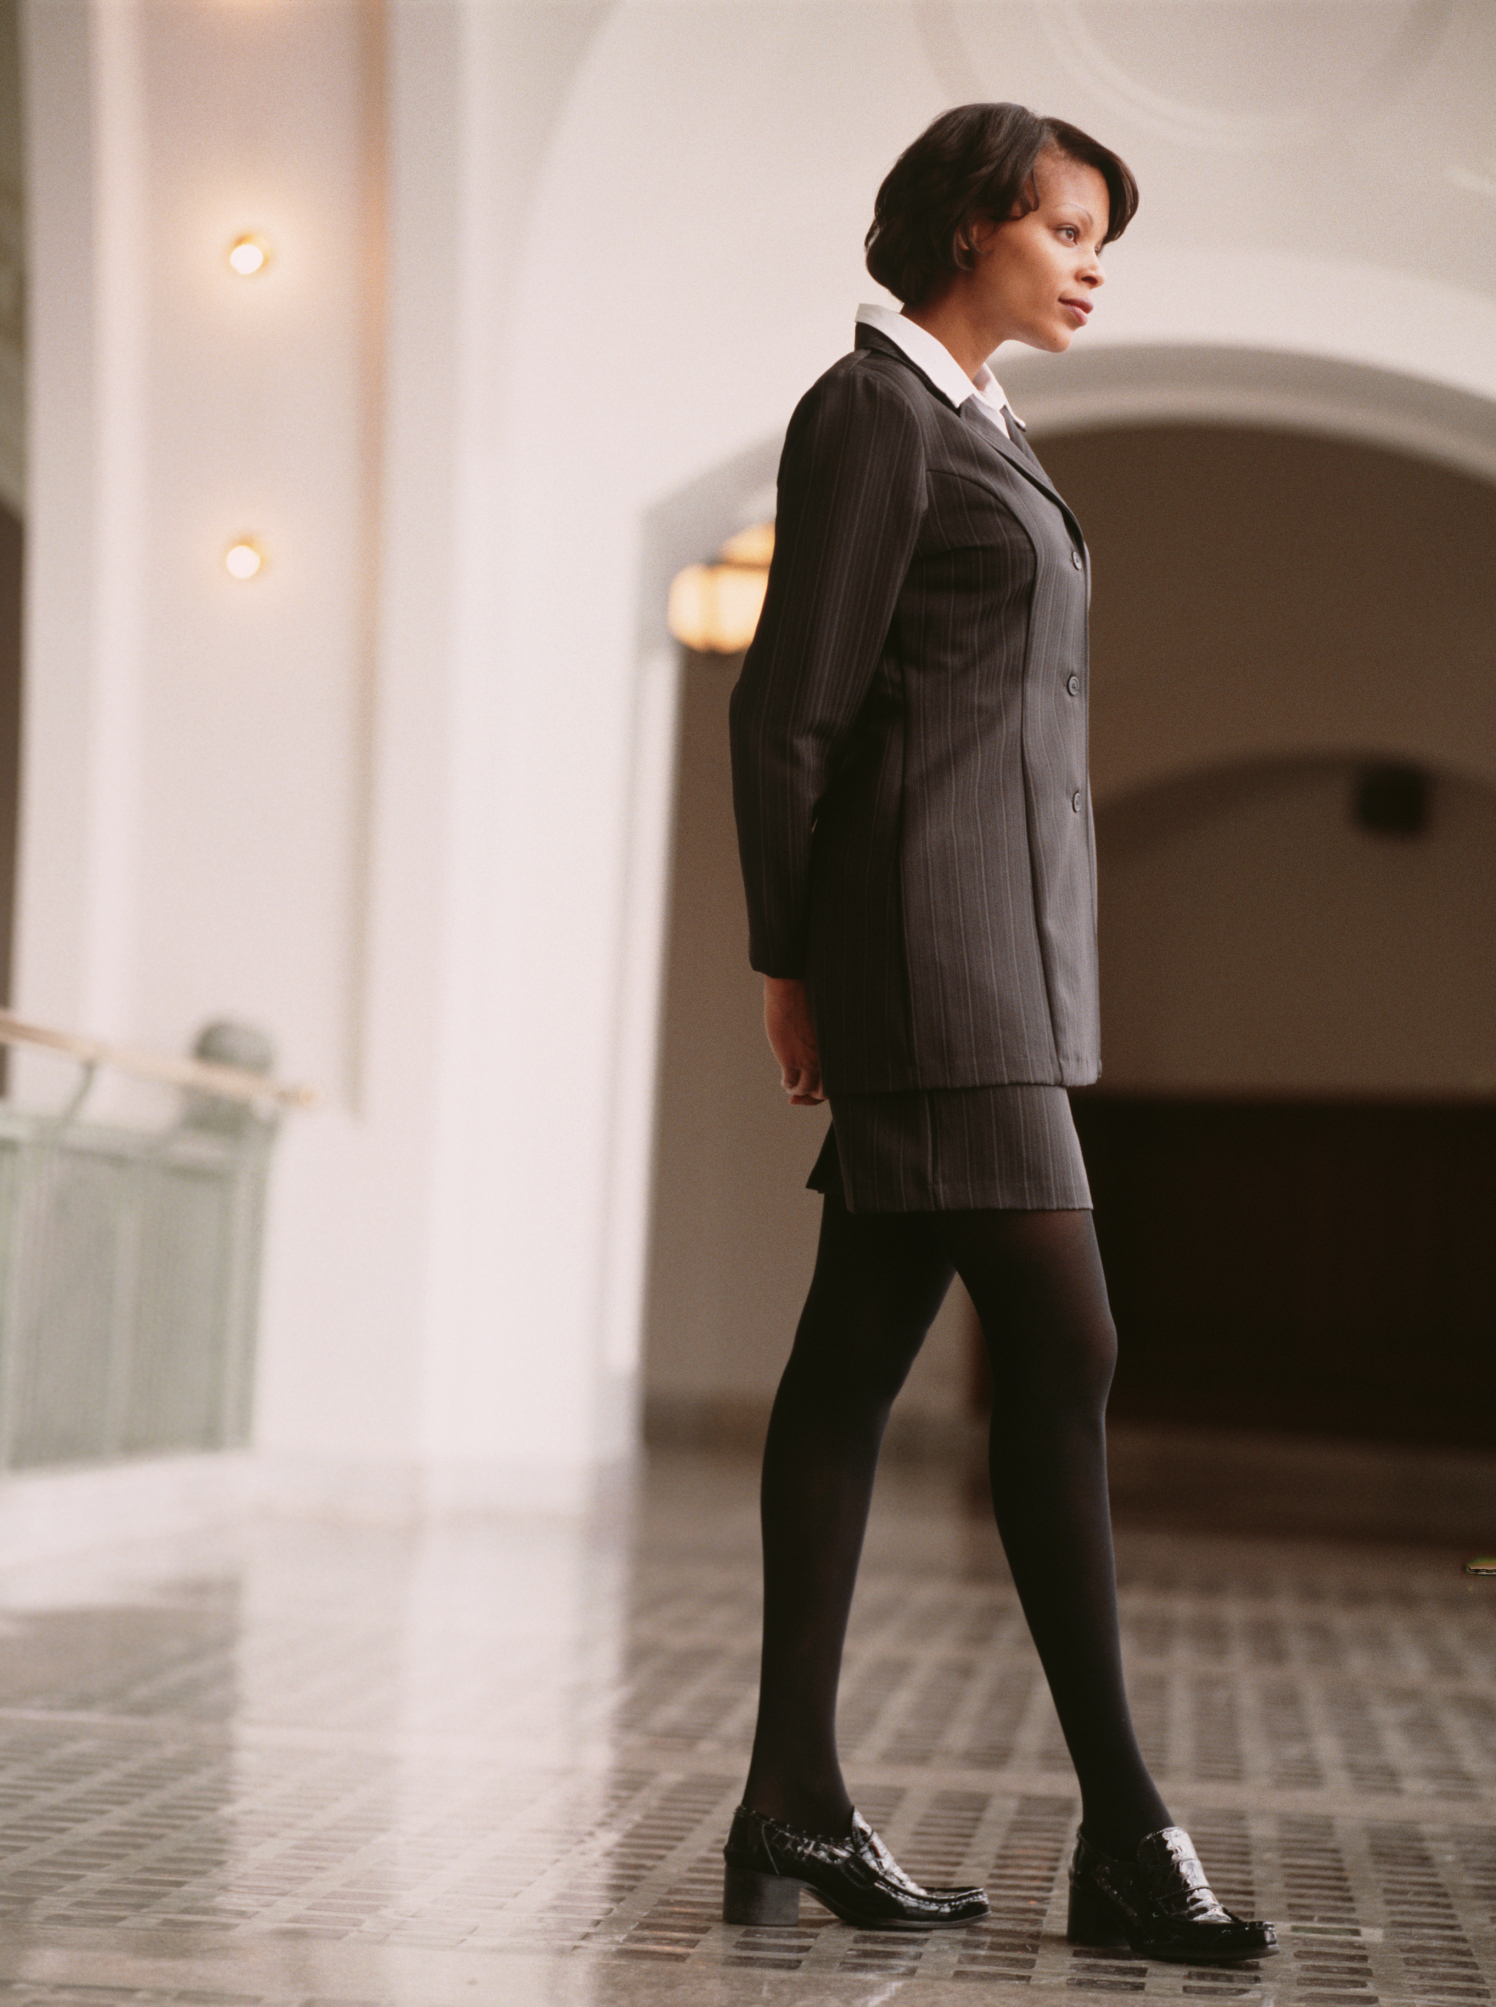 Vestido floreado corto con medias negras